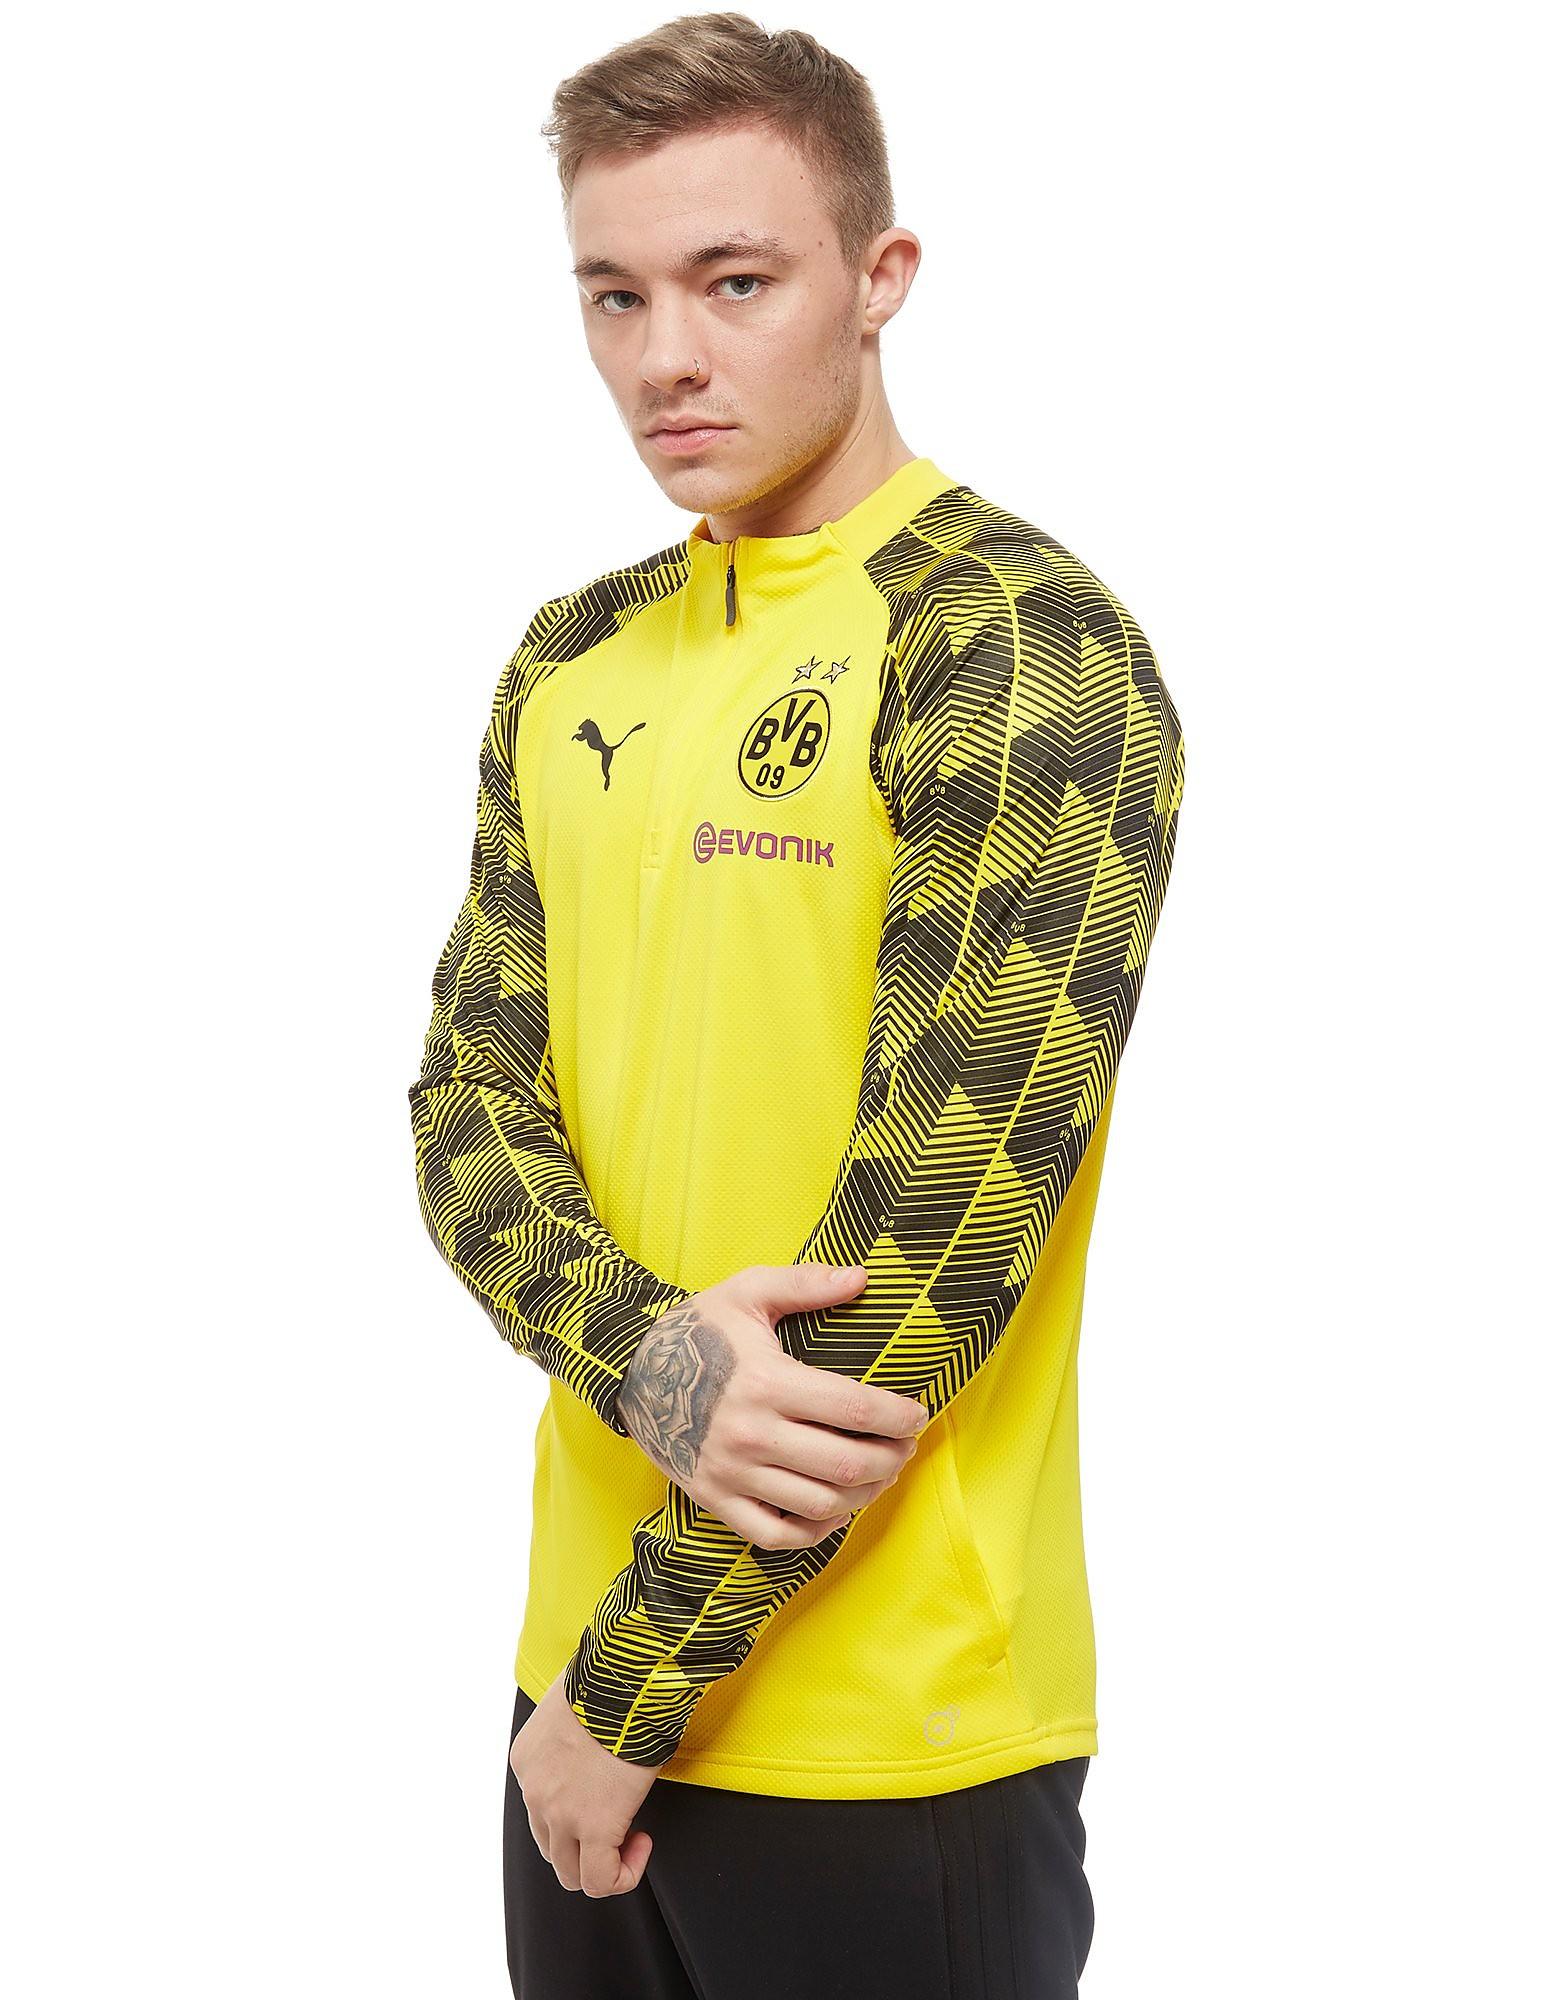 PUMA Borussia Dortmund 2018 1/4 Reißverschluss Trainingsoberteil